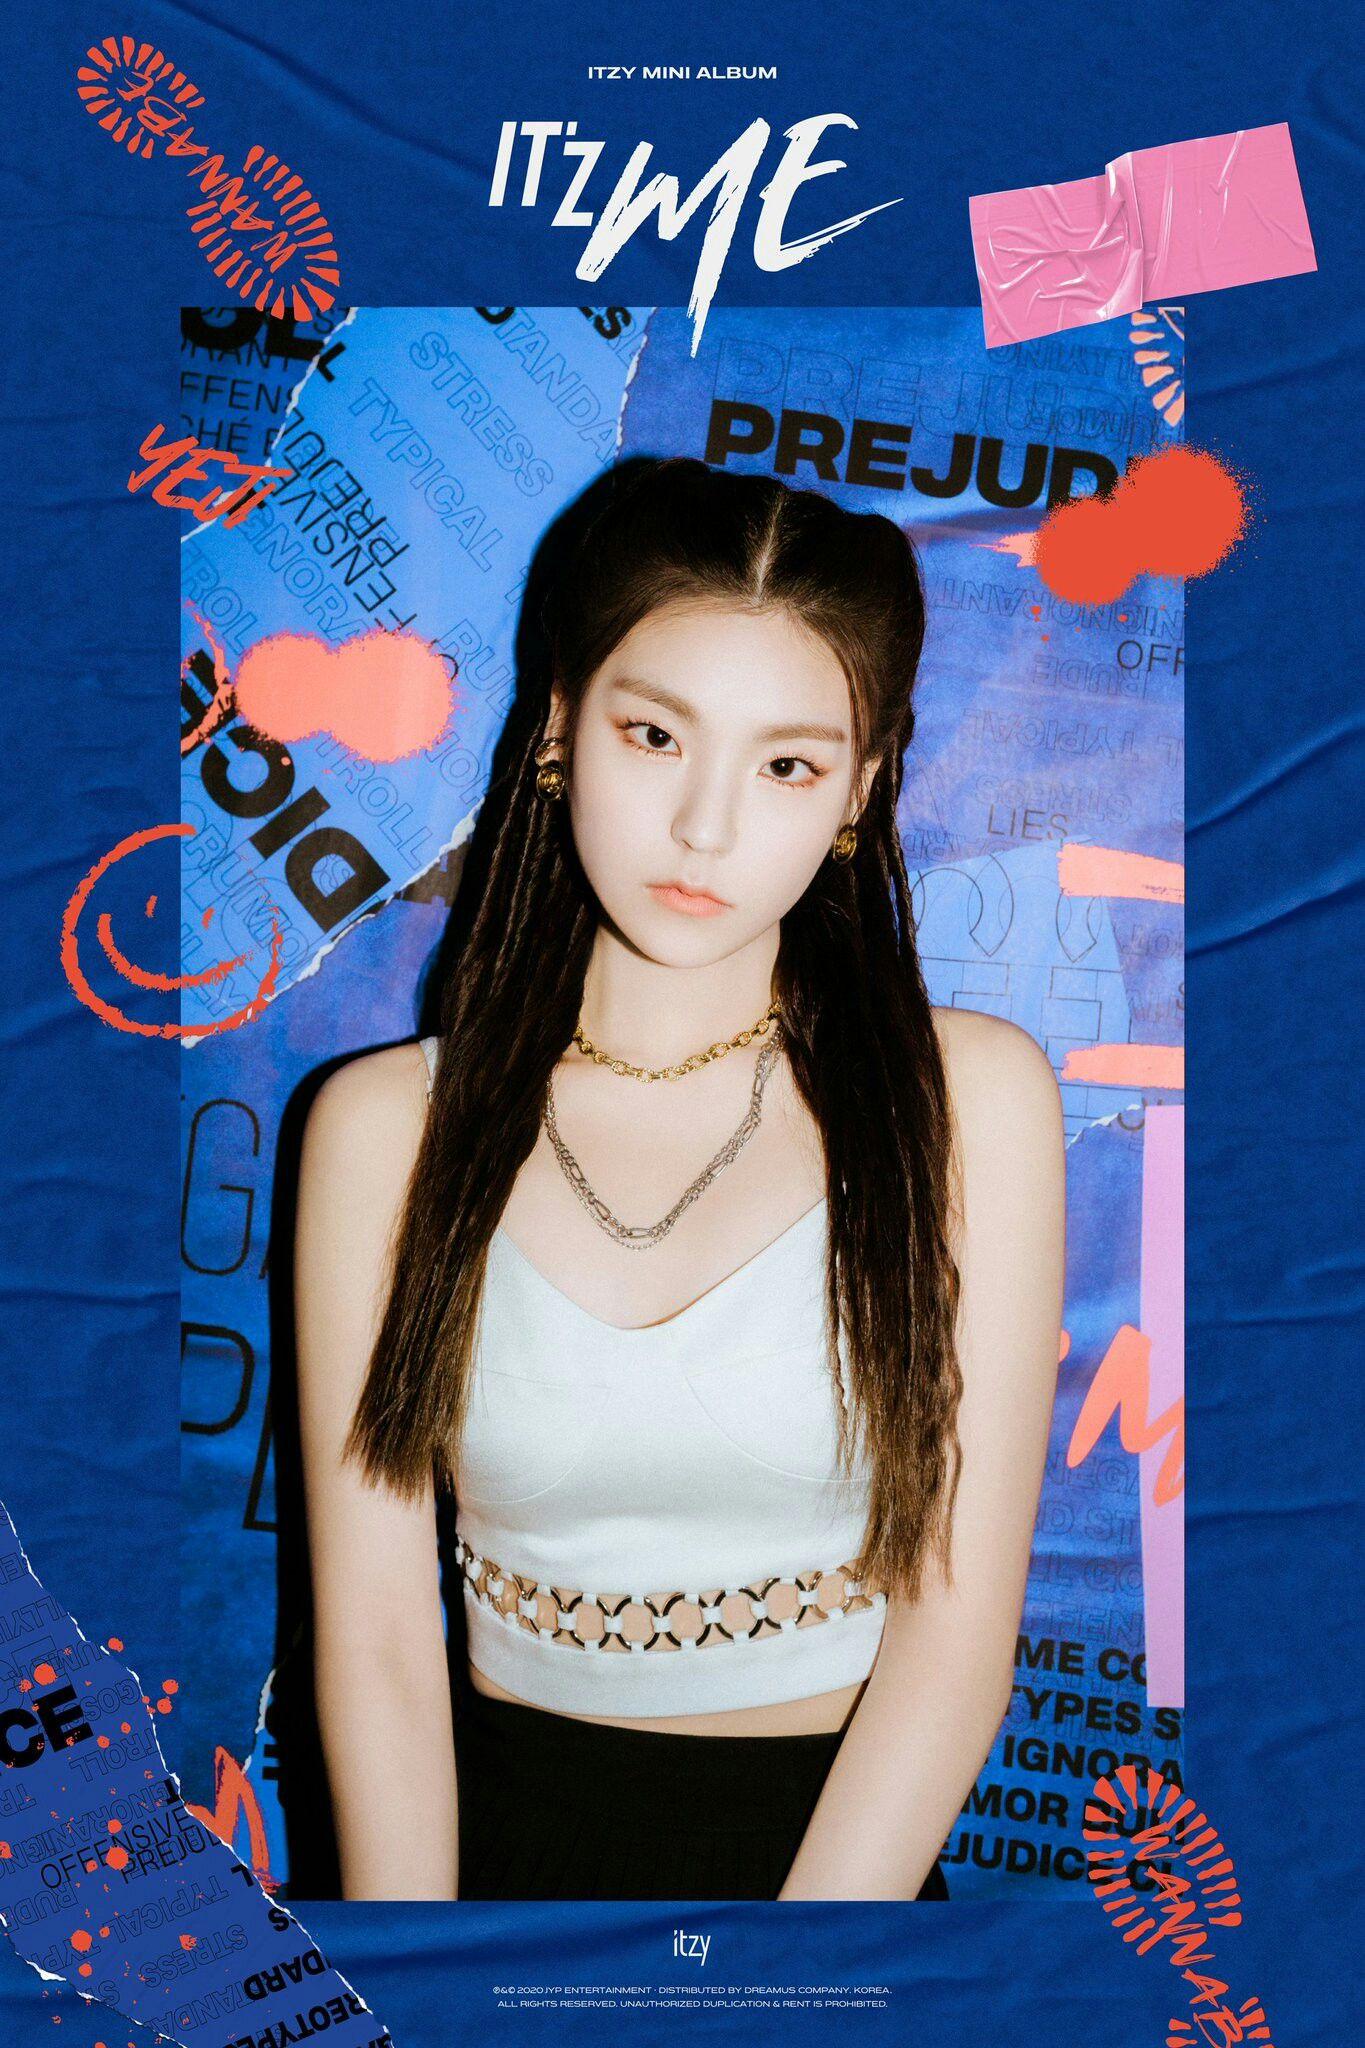 Pin by Jugu on iTZY YeJi / LuCy 예지 in 2020 Mini albums